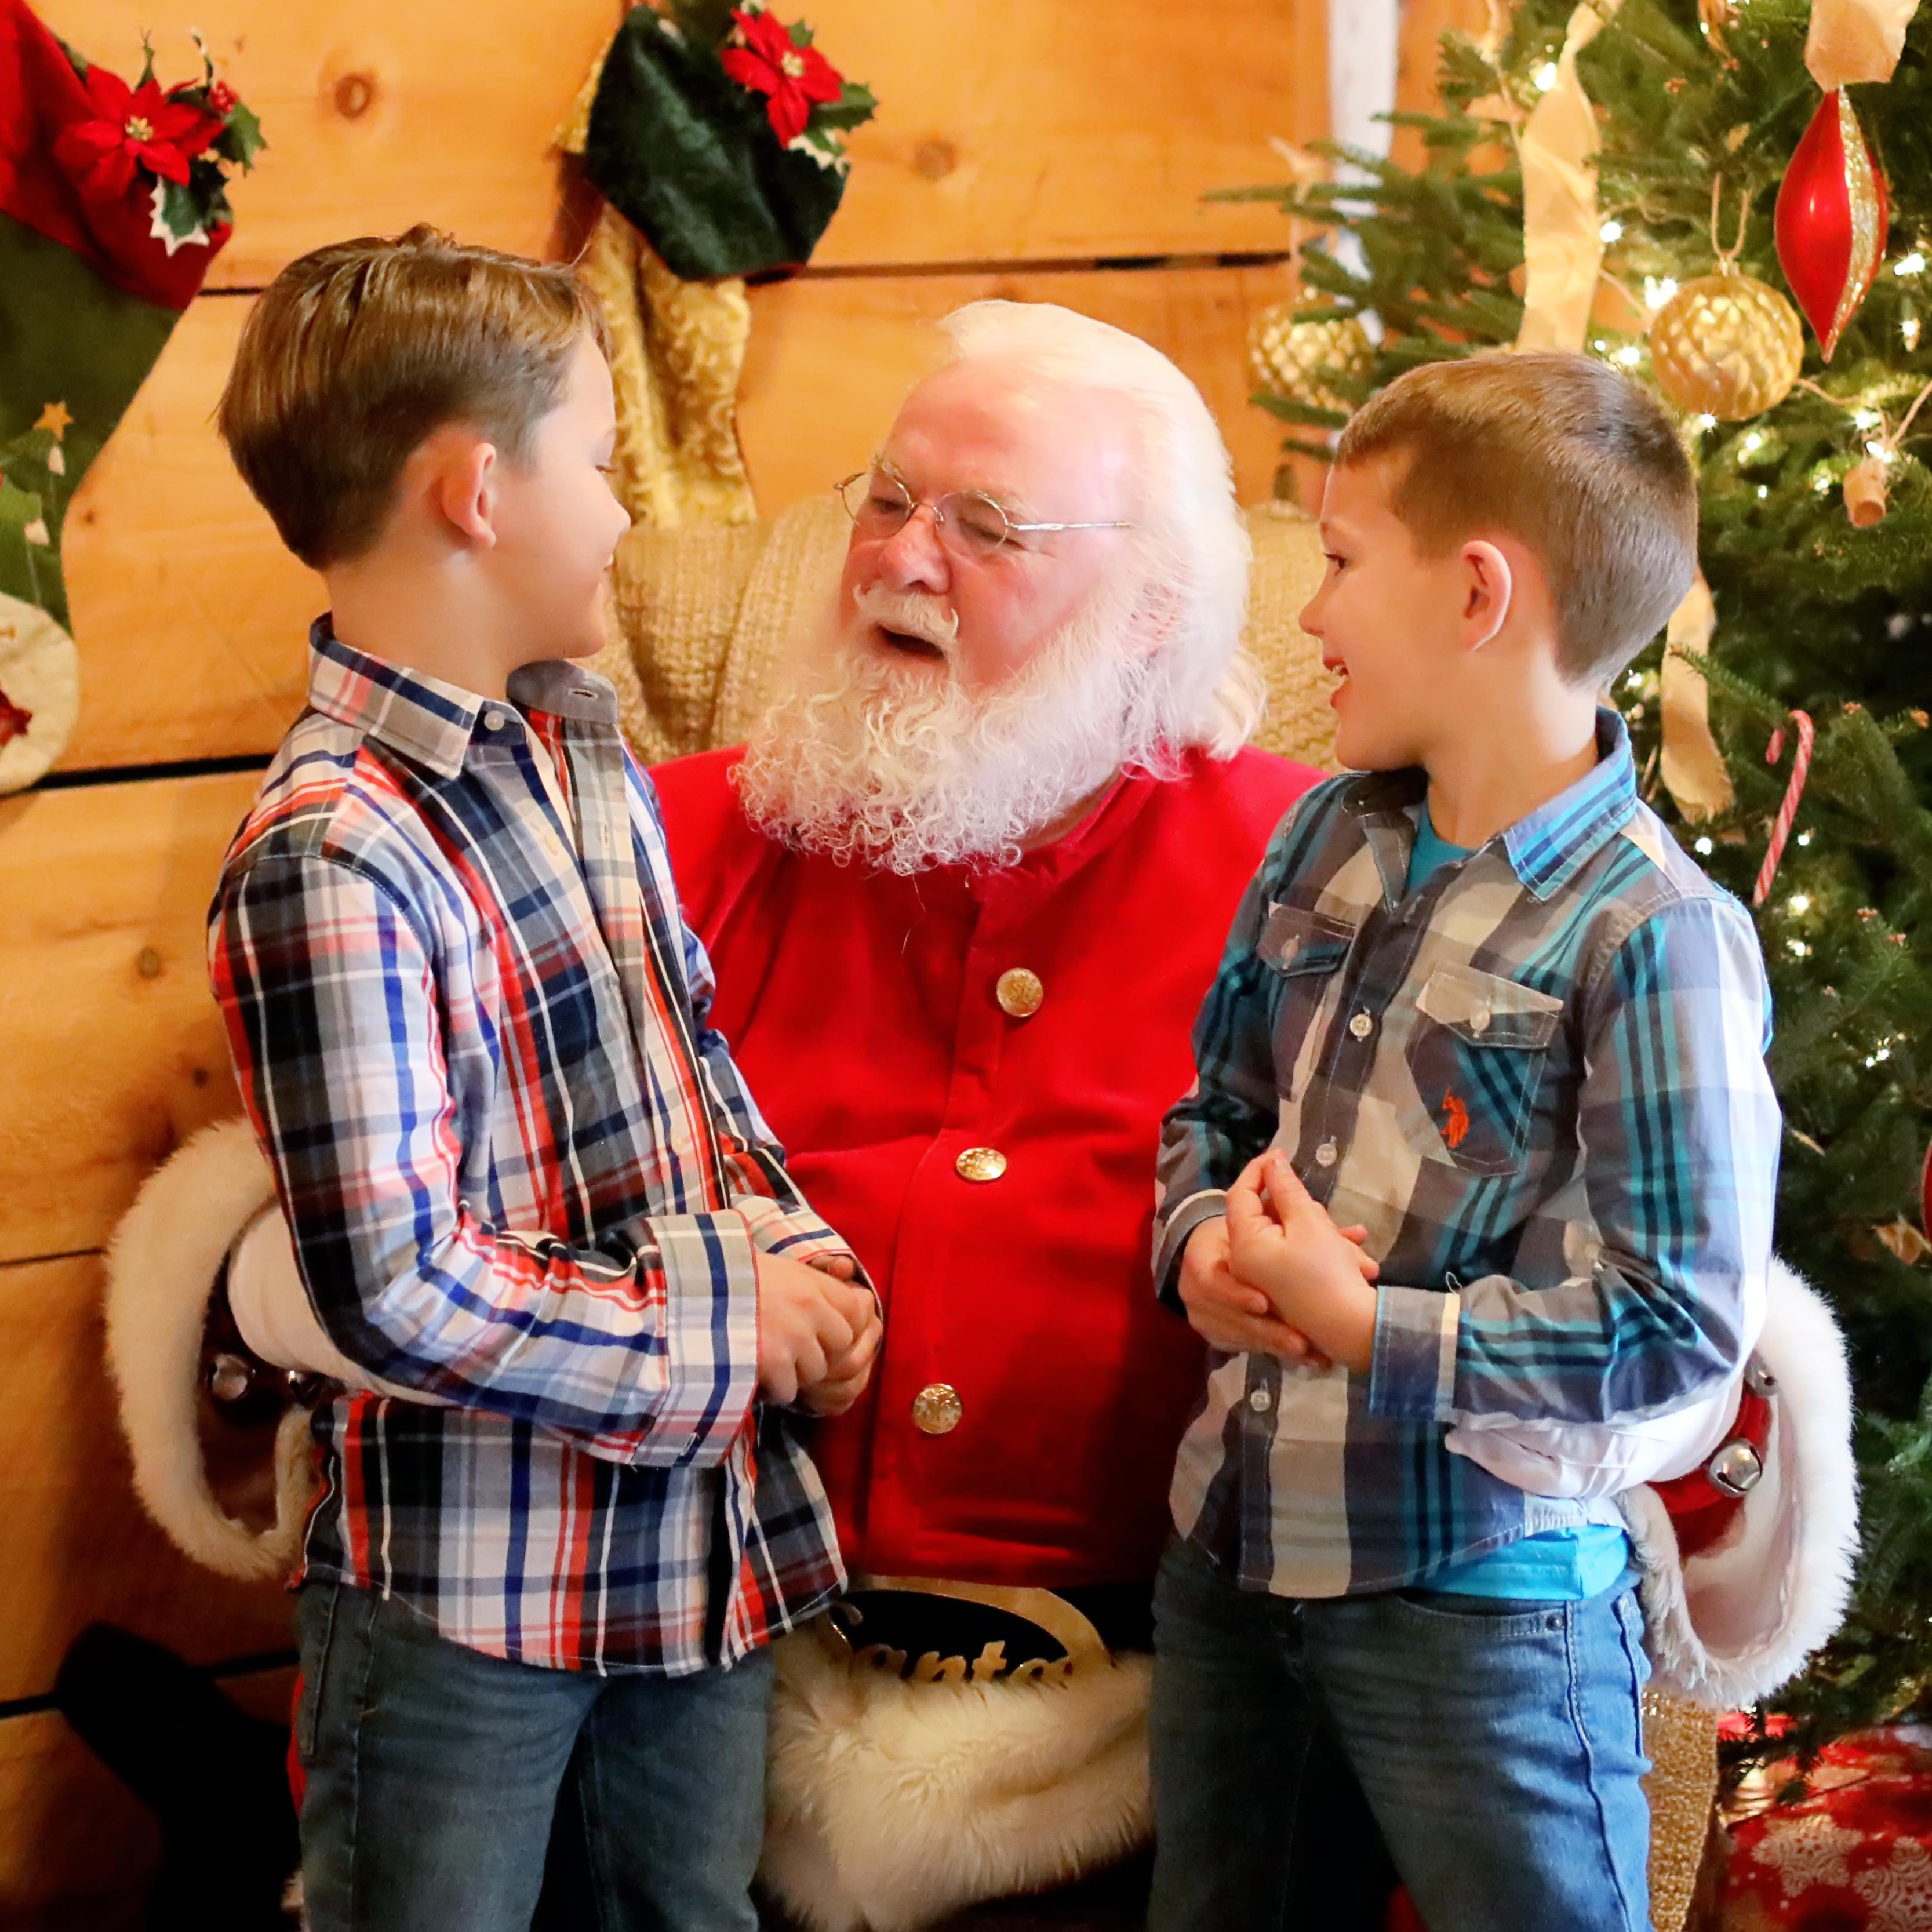 2 kids with santa